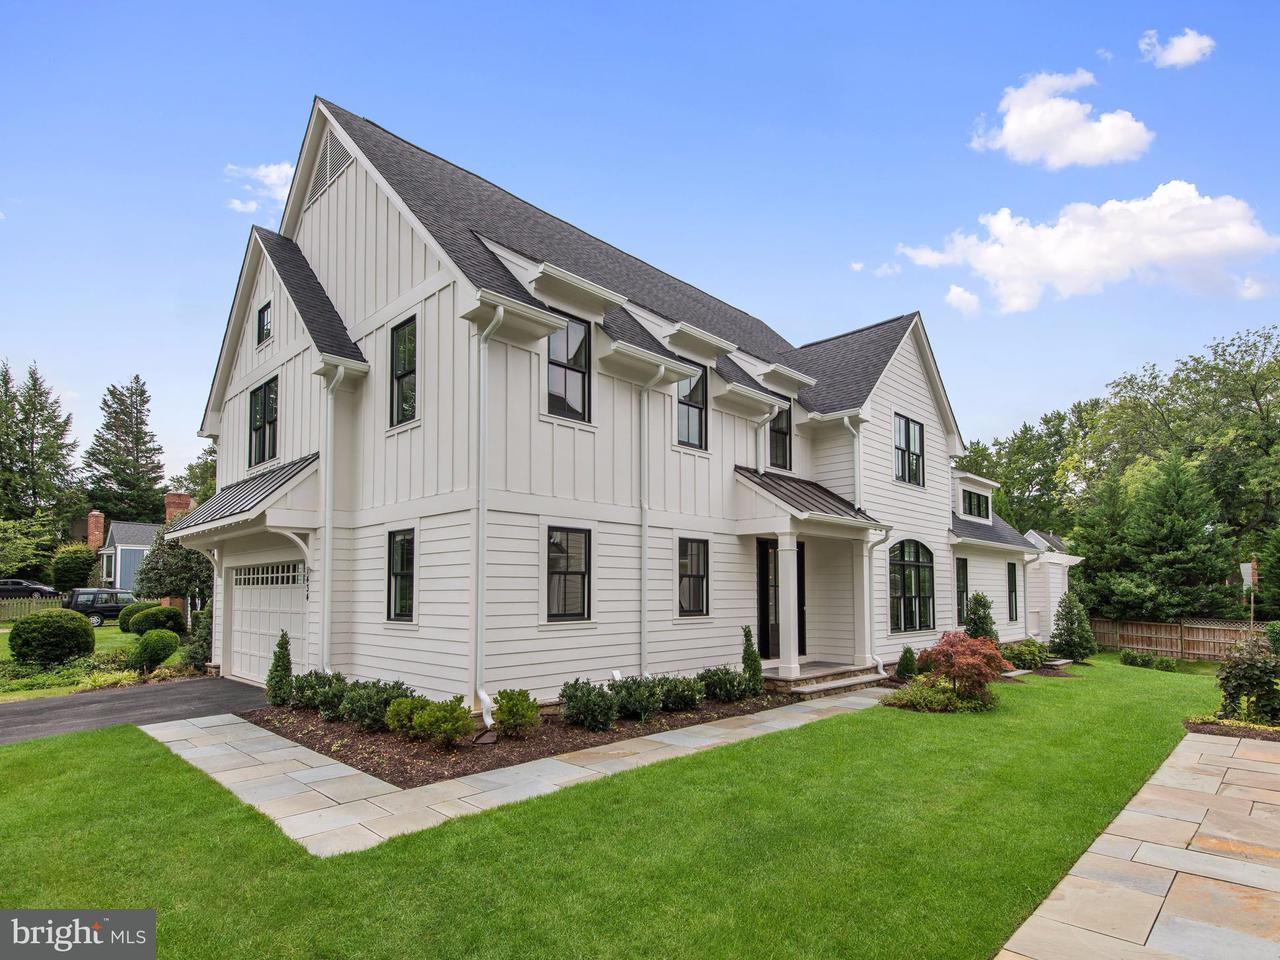 Single Family Home for Sale at 1434 CEDAR Avenue 1434 CEDAR Avenue McLean, Virginia 22101 United States